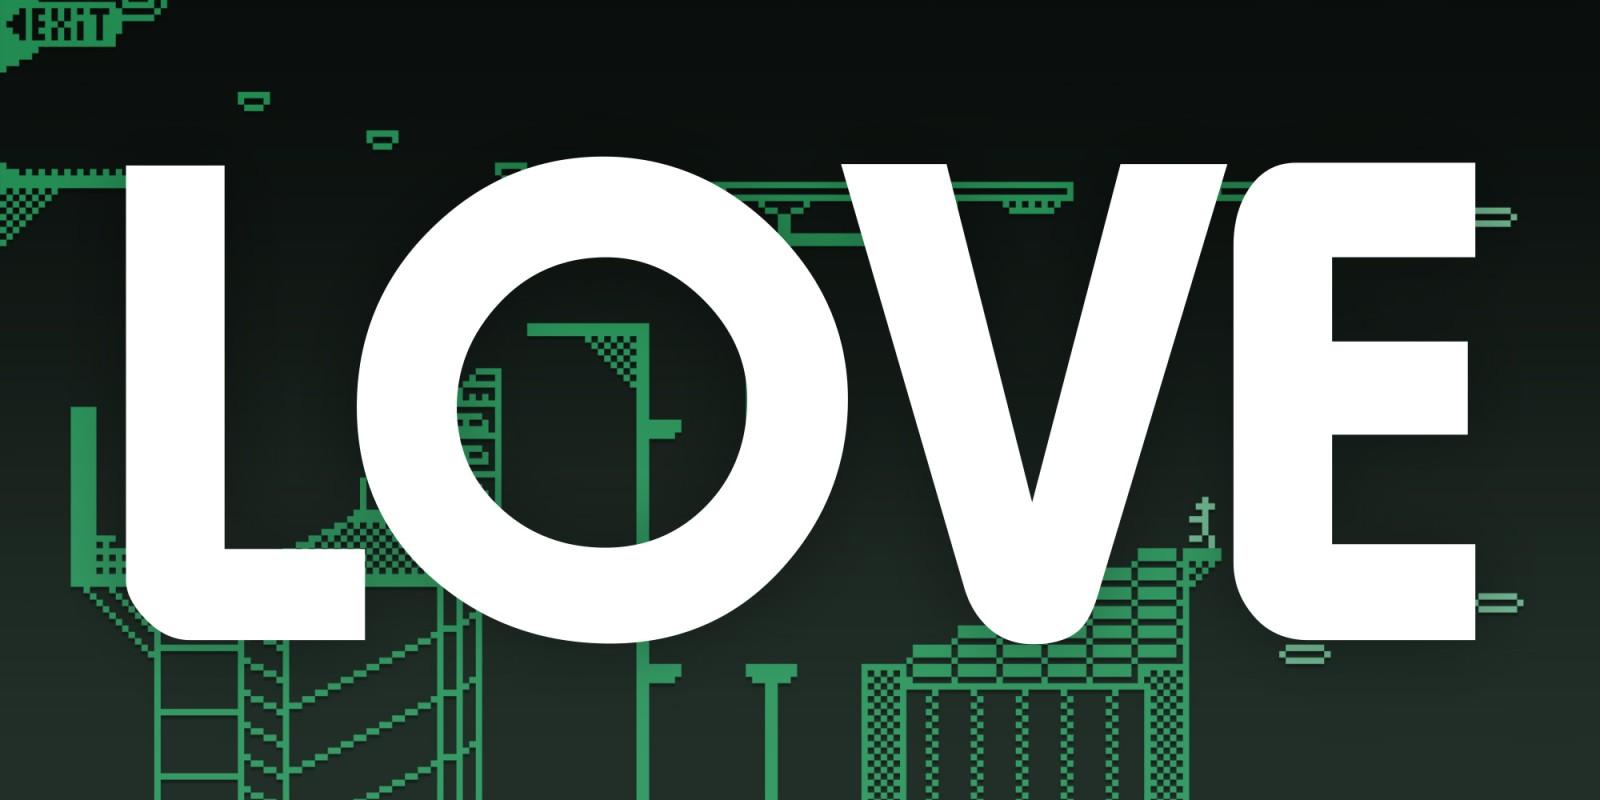 LOVE | Nintendo Switch download software | Games | Nintendo